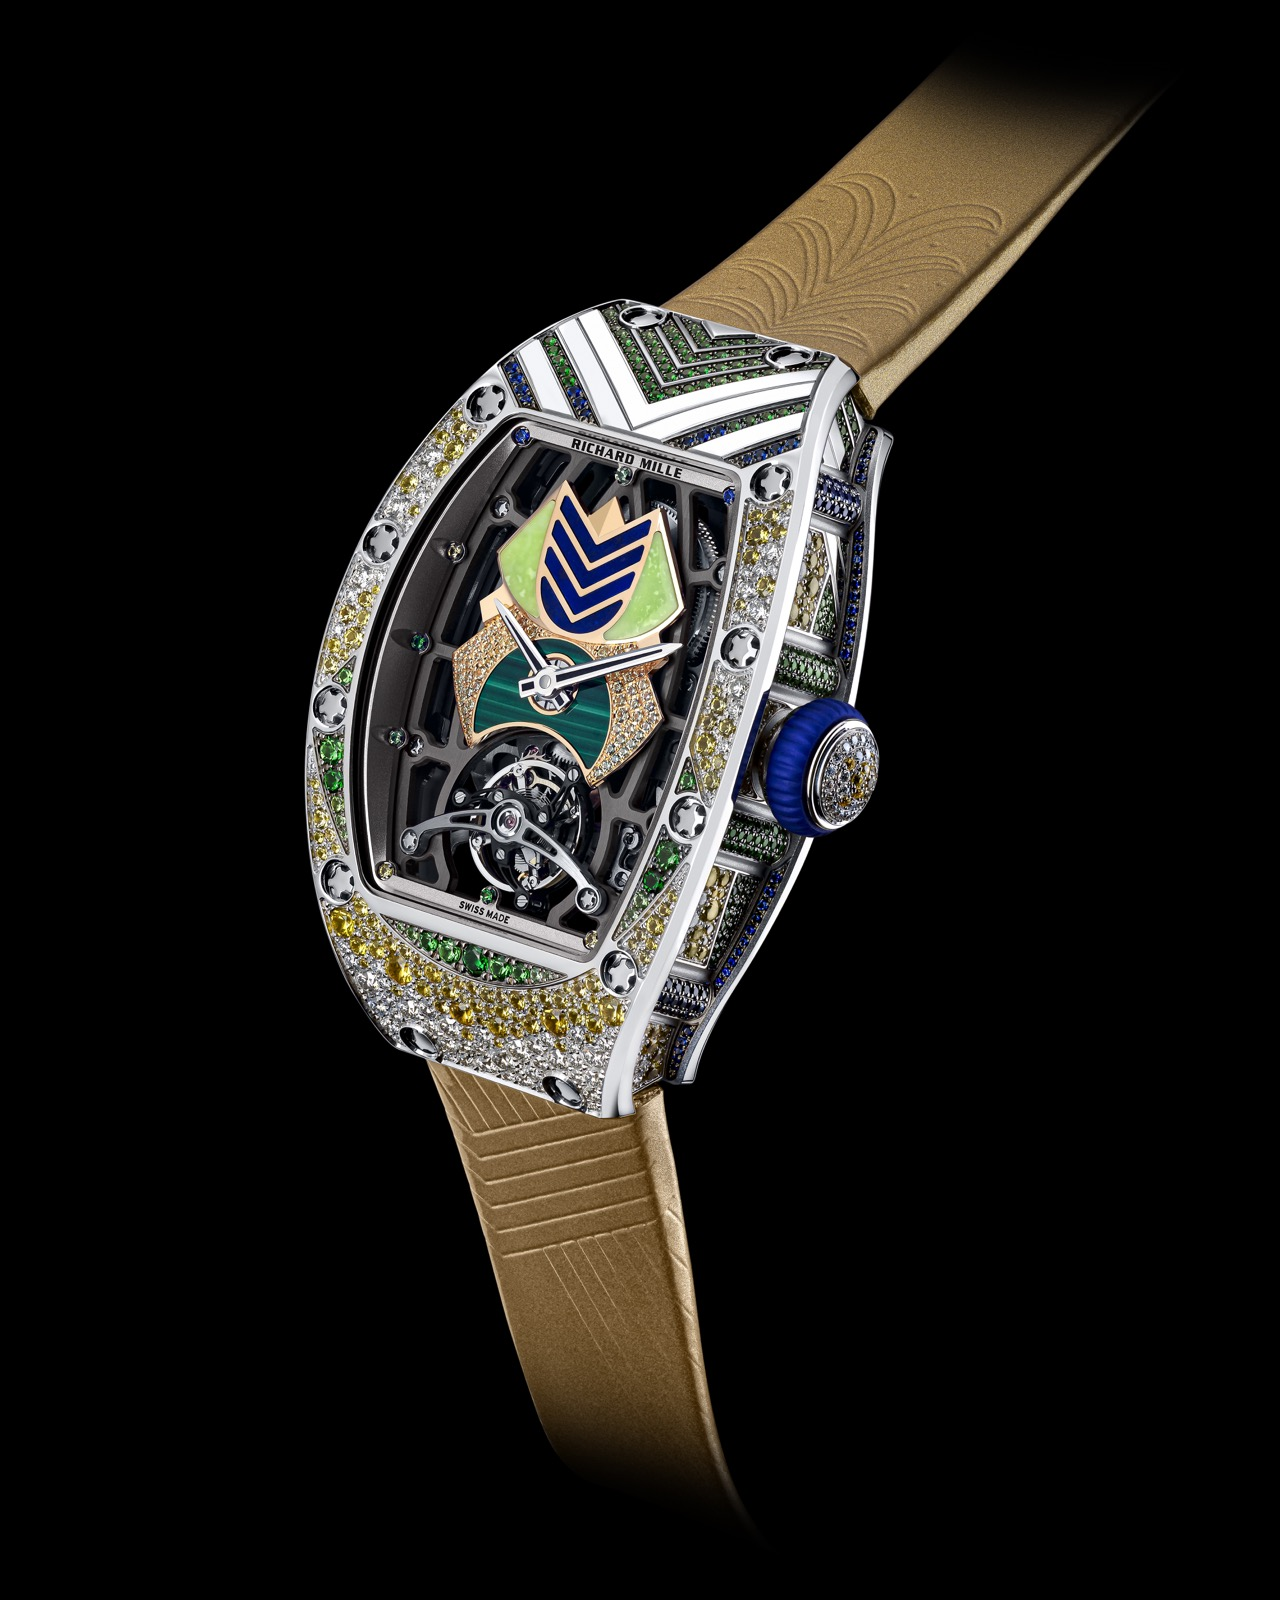 Richard Mille RM 72-02 Tourbillon Automatic Talisman